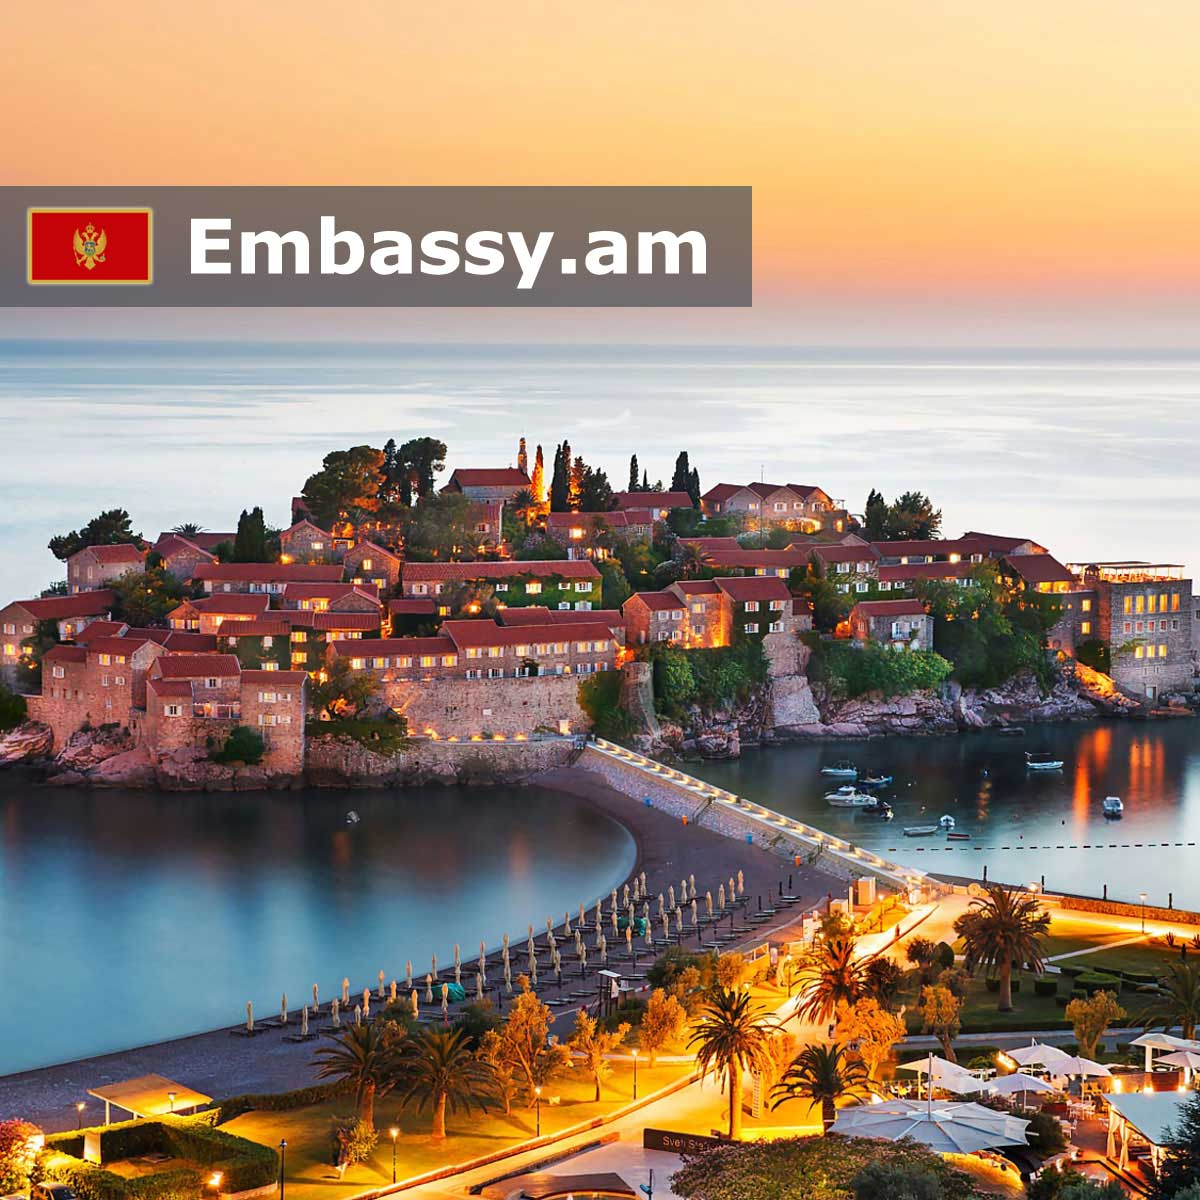 Hotels in Montenegro- Embassy.am